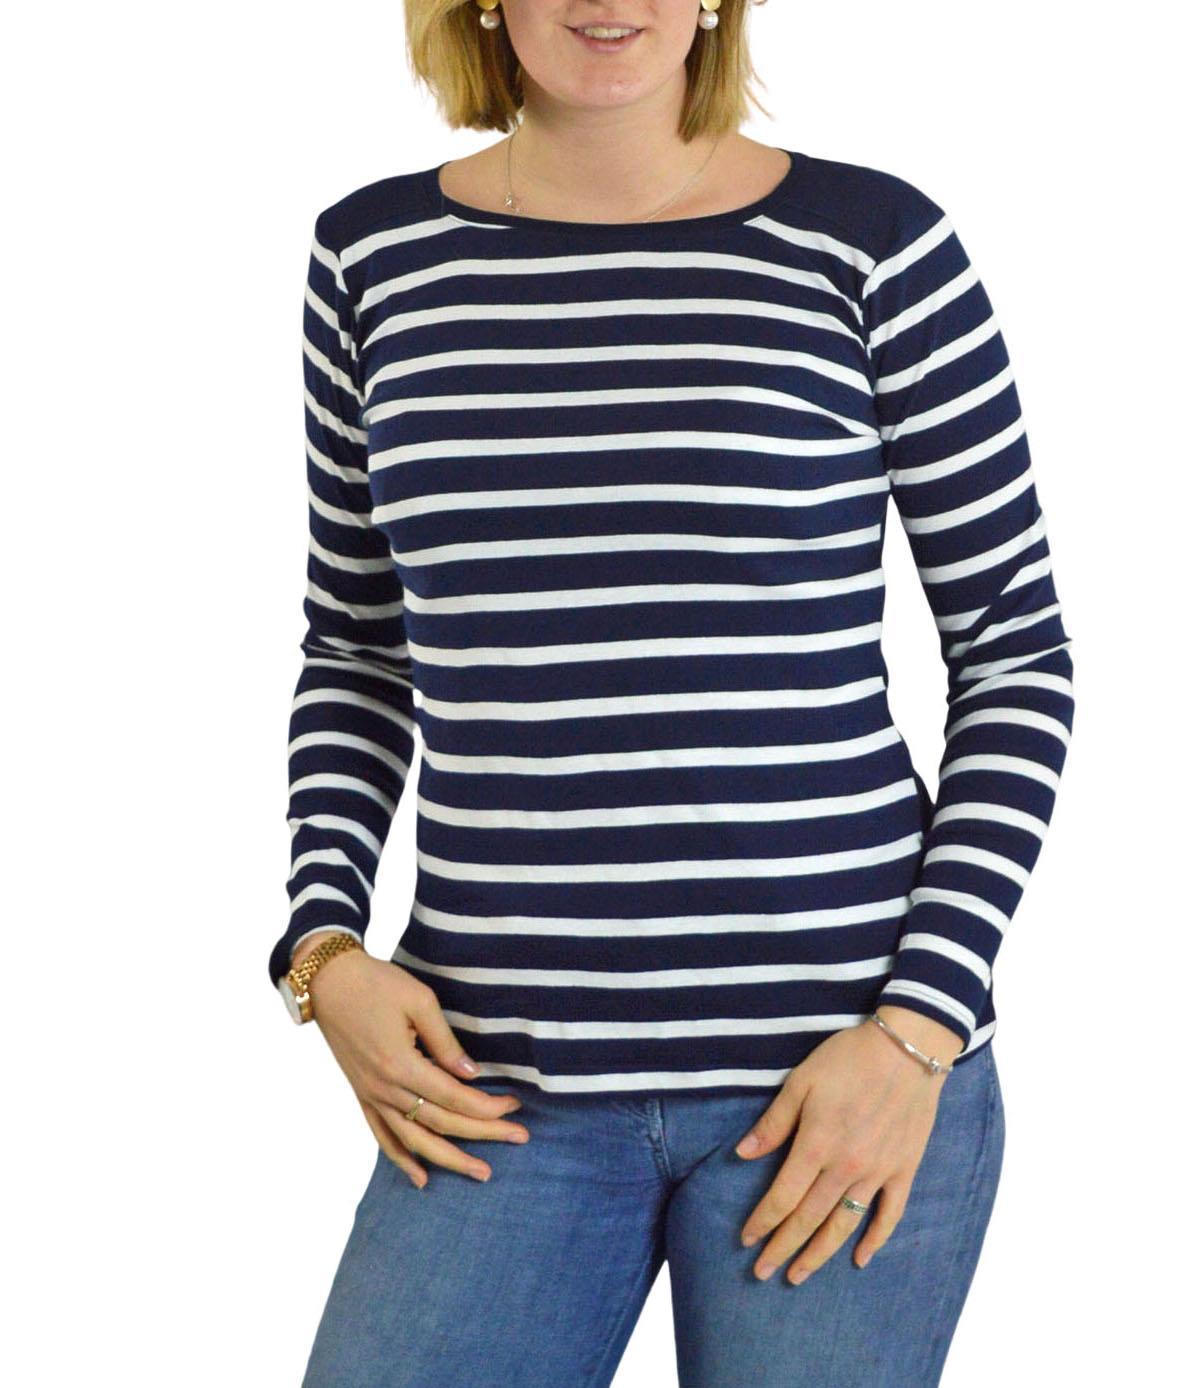 Ladies-Black-or-Navy-White-Stripe-Long-Sleeve-T-Shirt-Top thumbnail 9